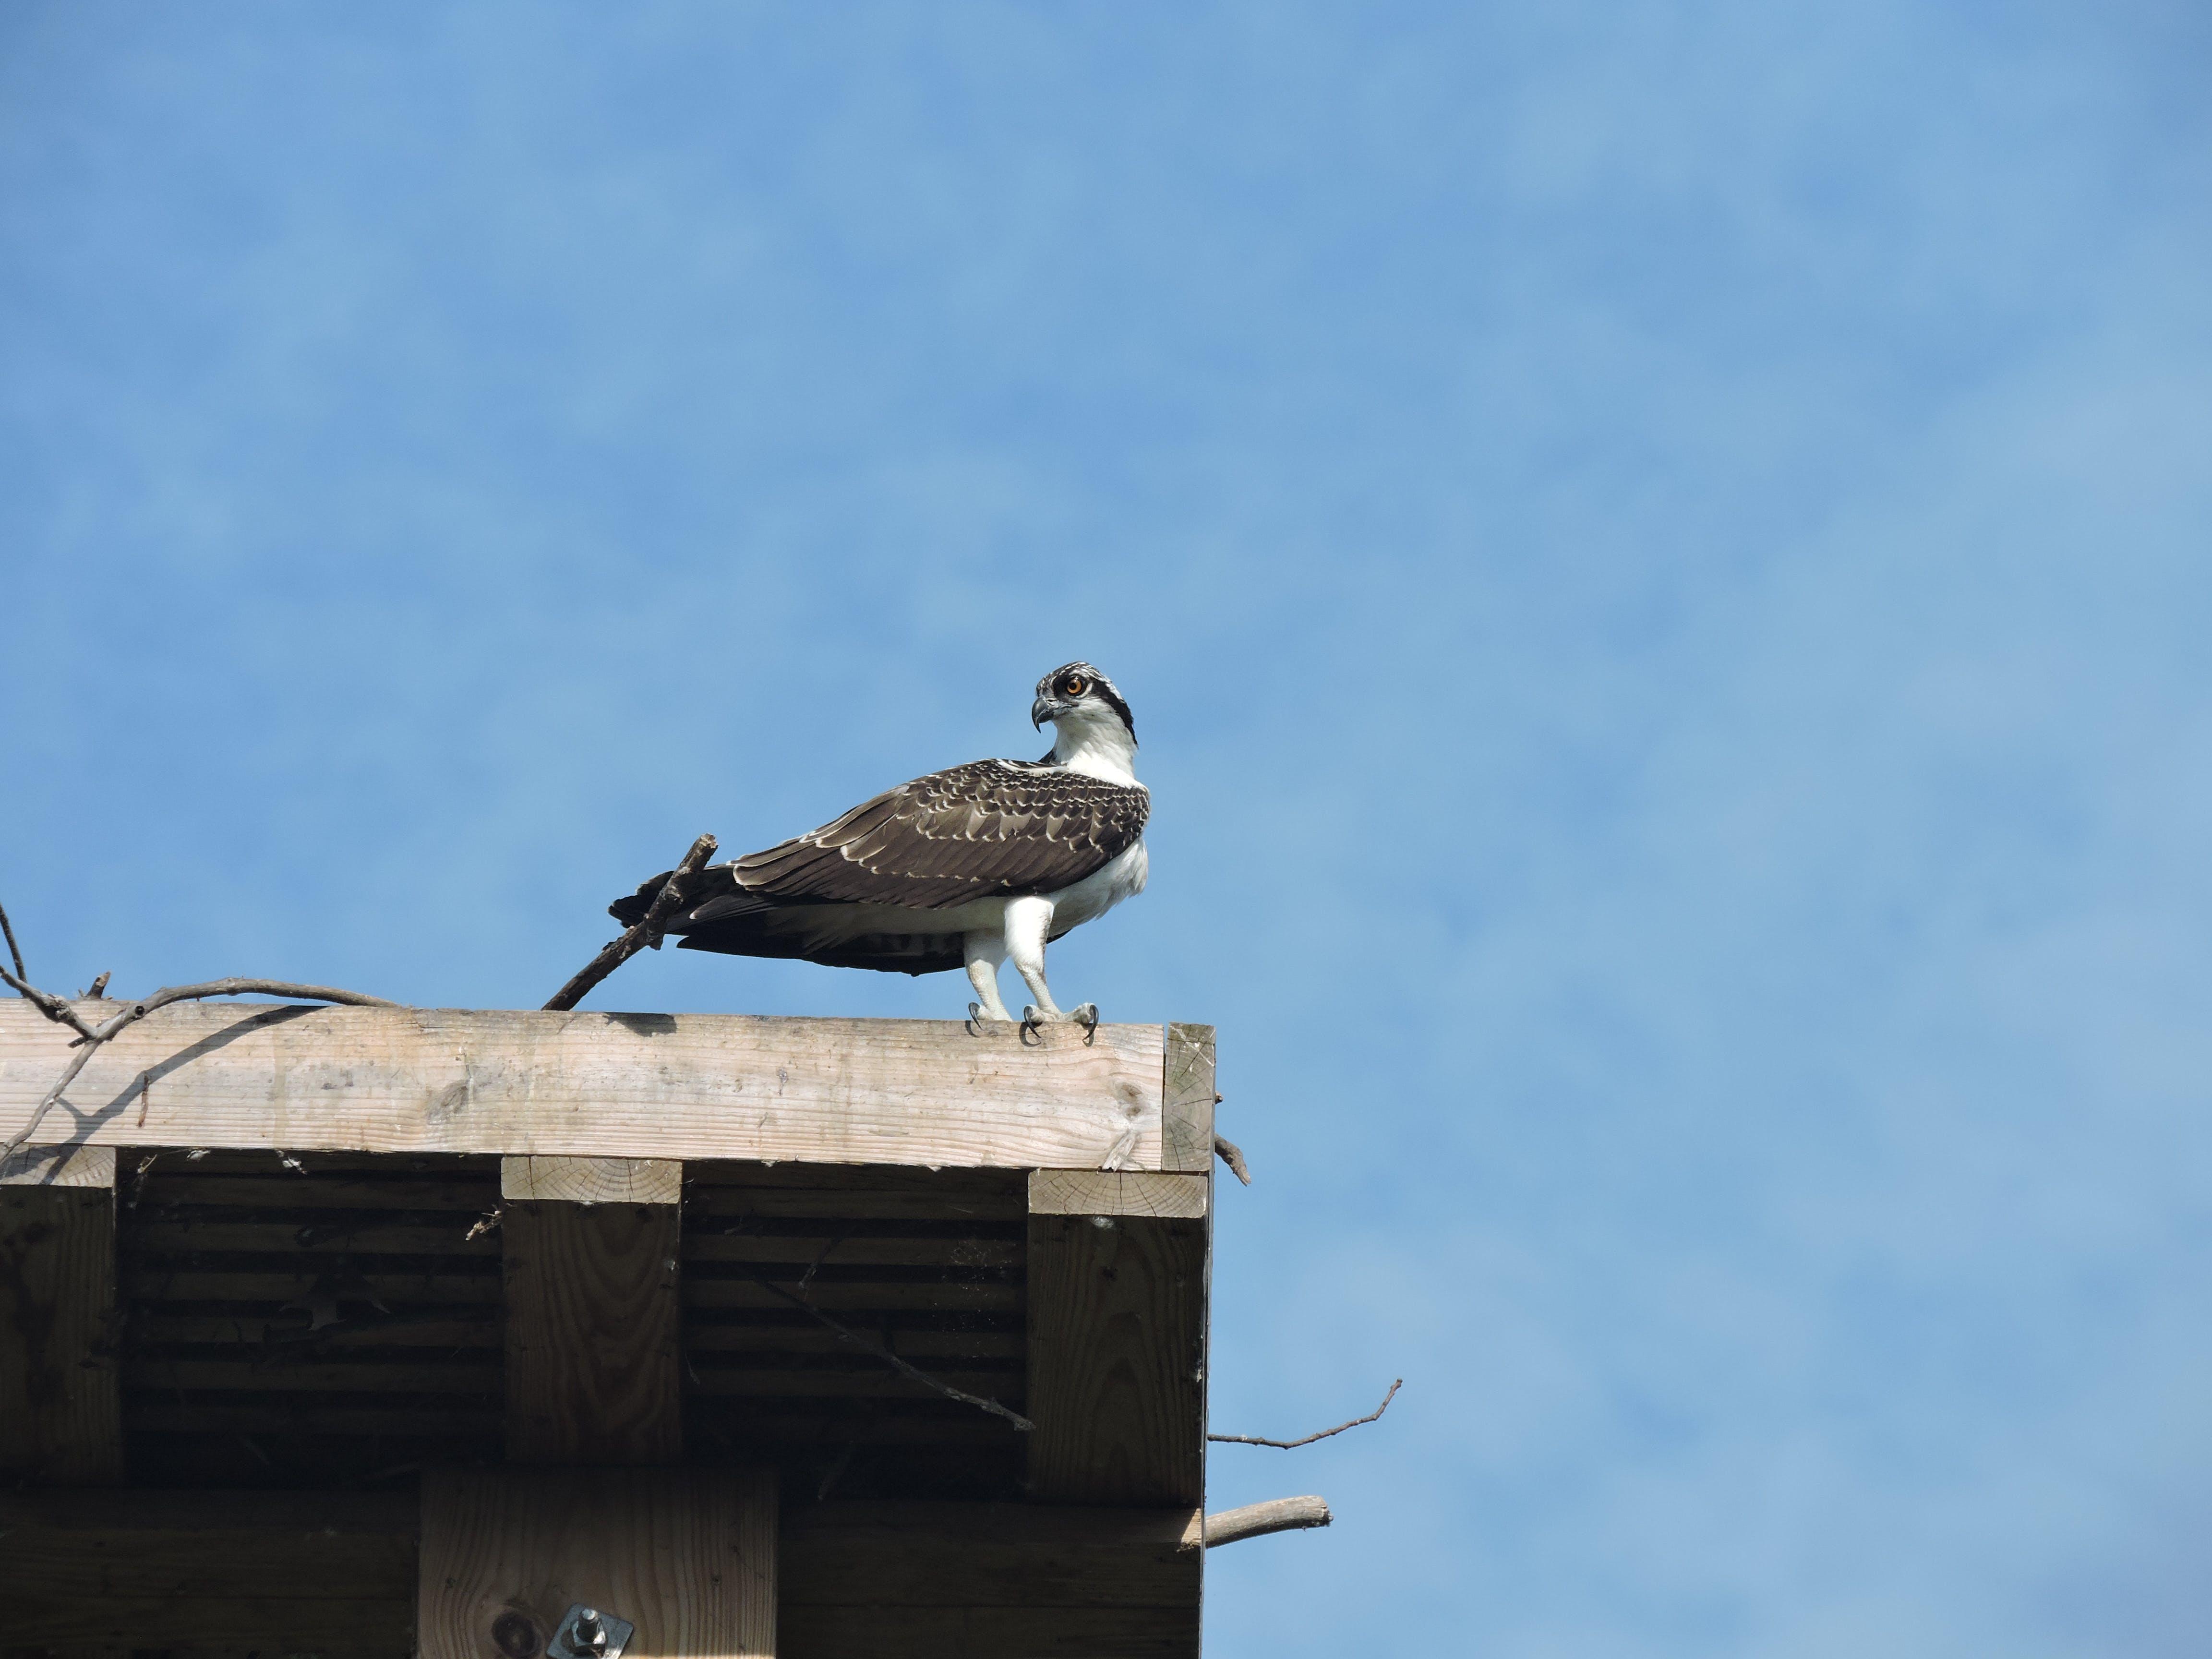 Free stock photo of bird, perched bird